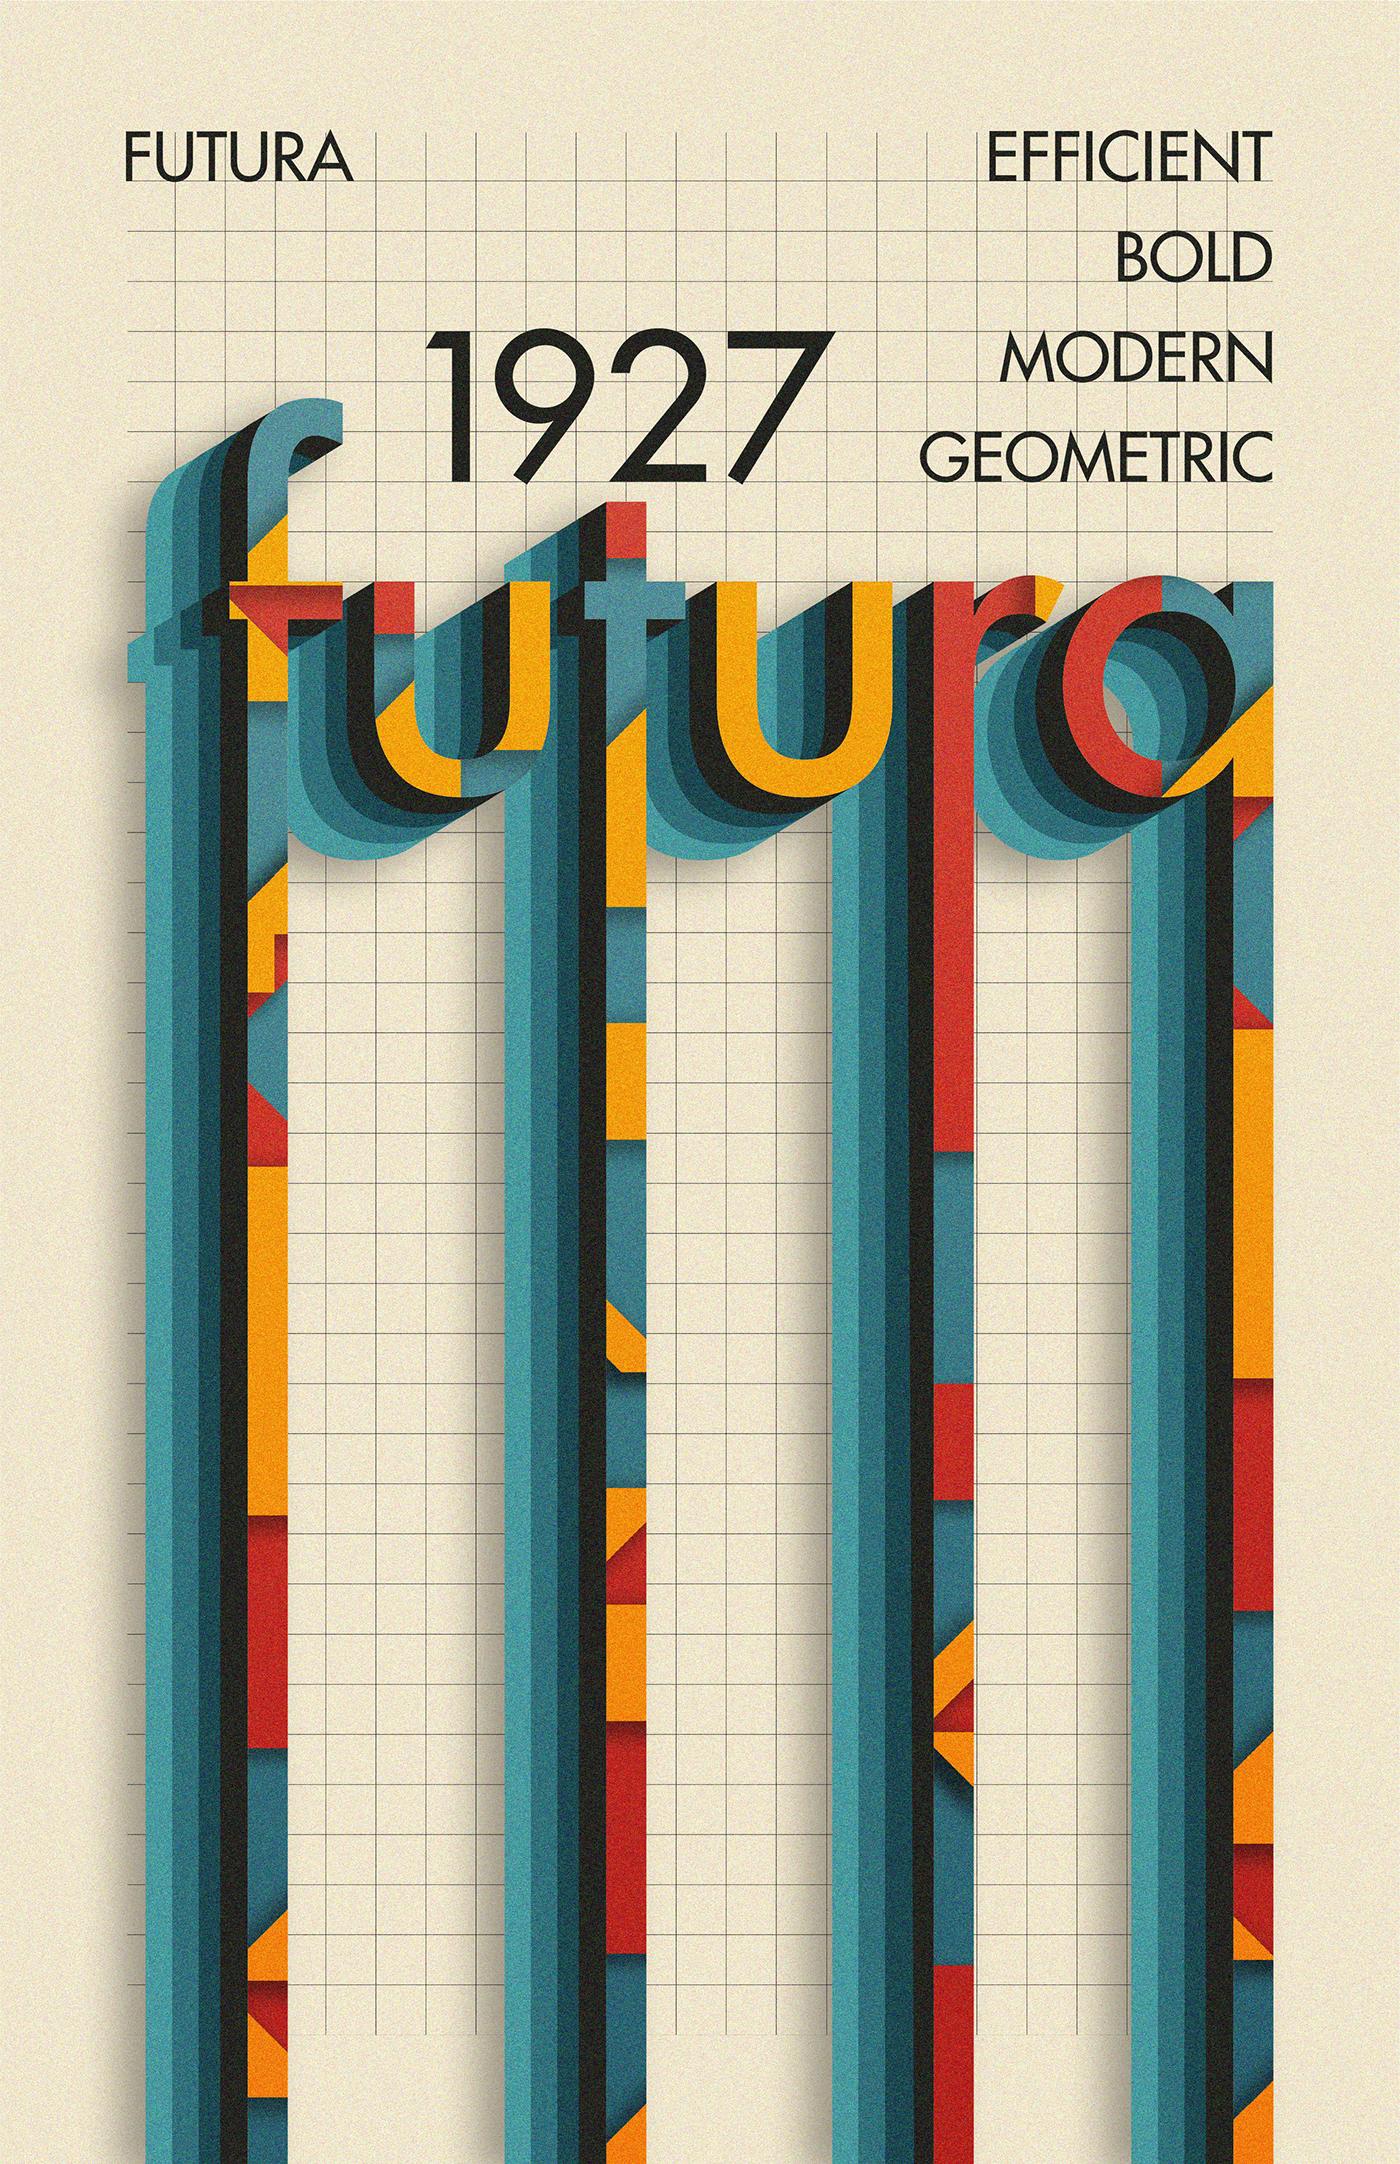 typography   Futura primary New Typography bauhaus modern geometric grid